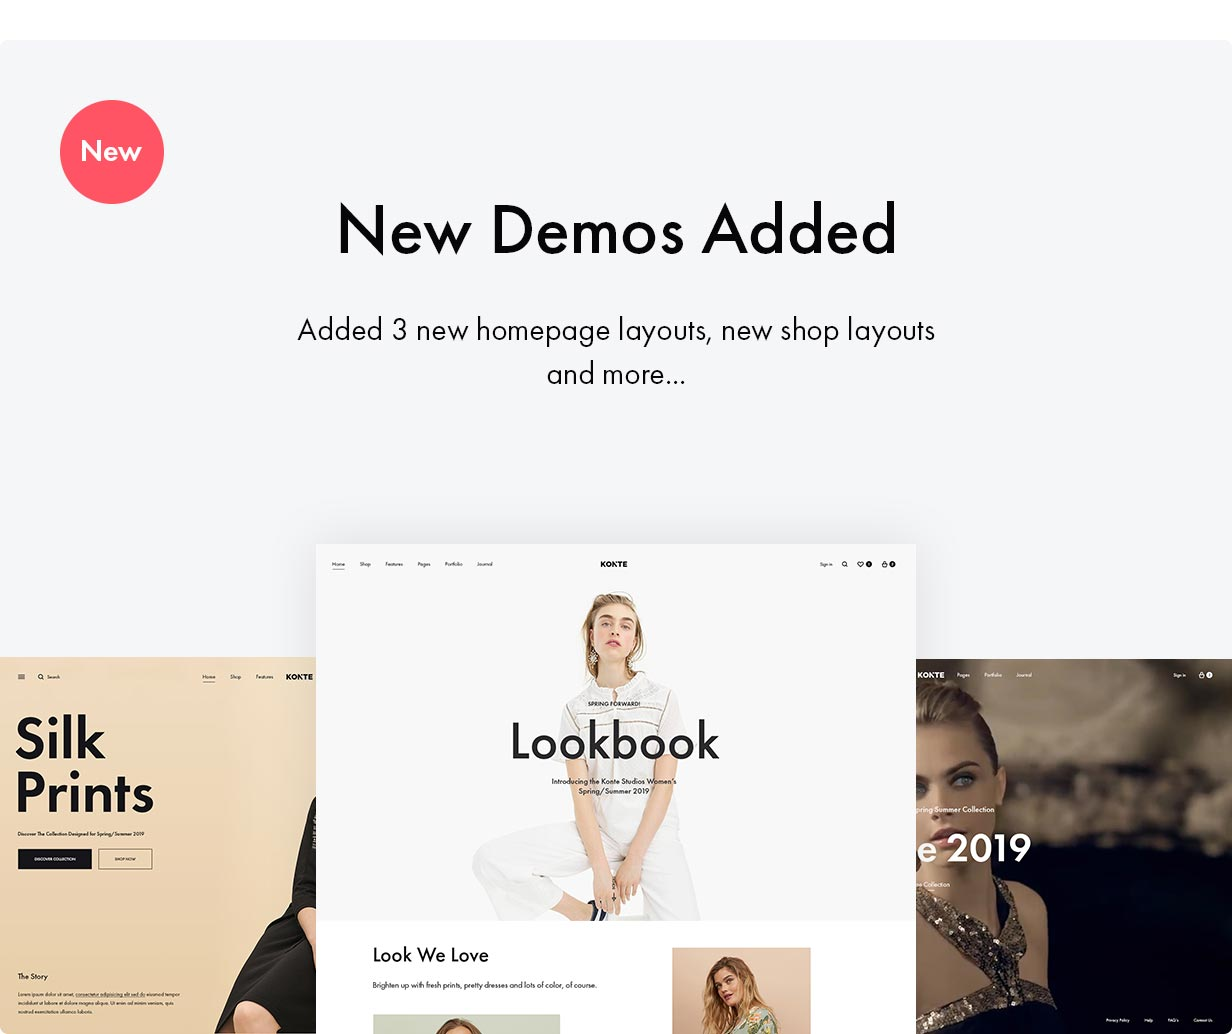 Konte WooCommerce theme - New demos added in verison 2.0